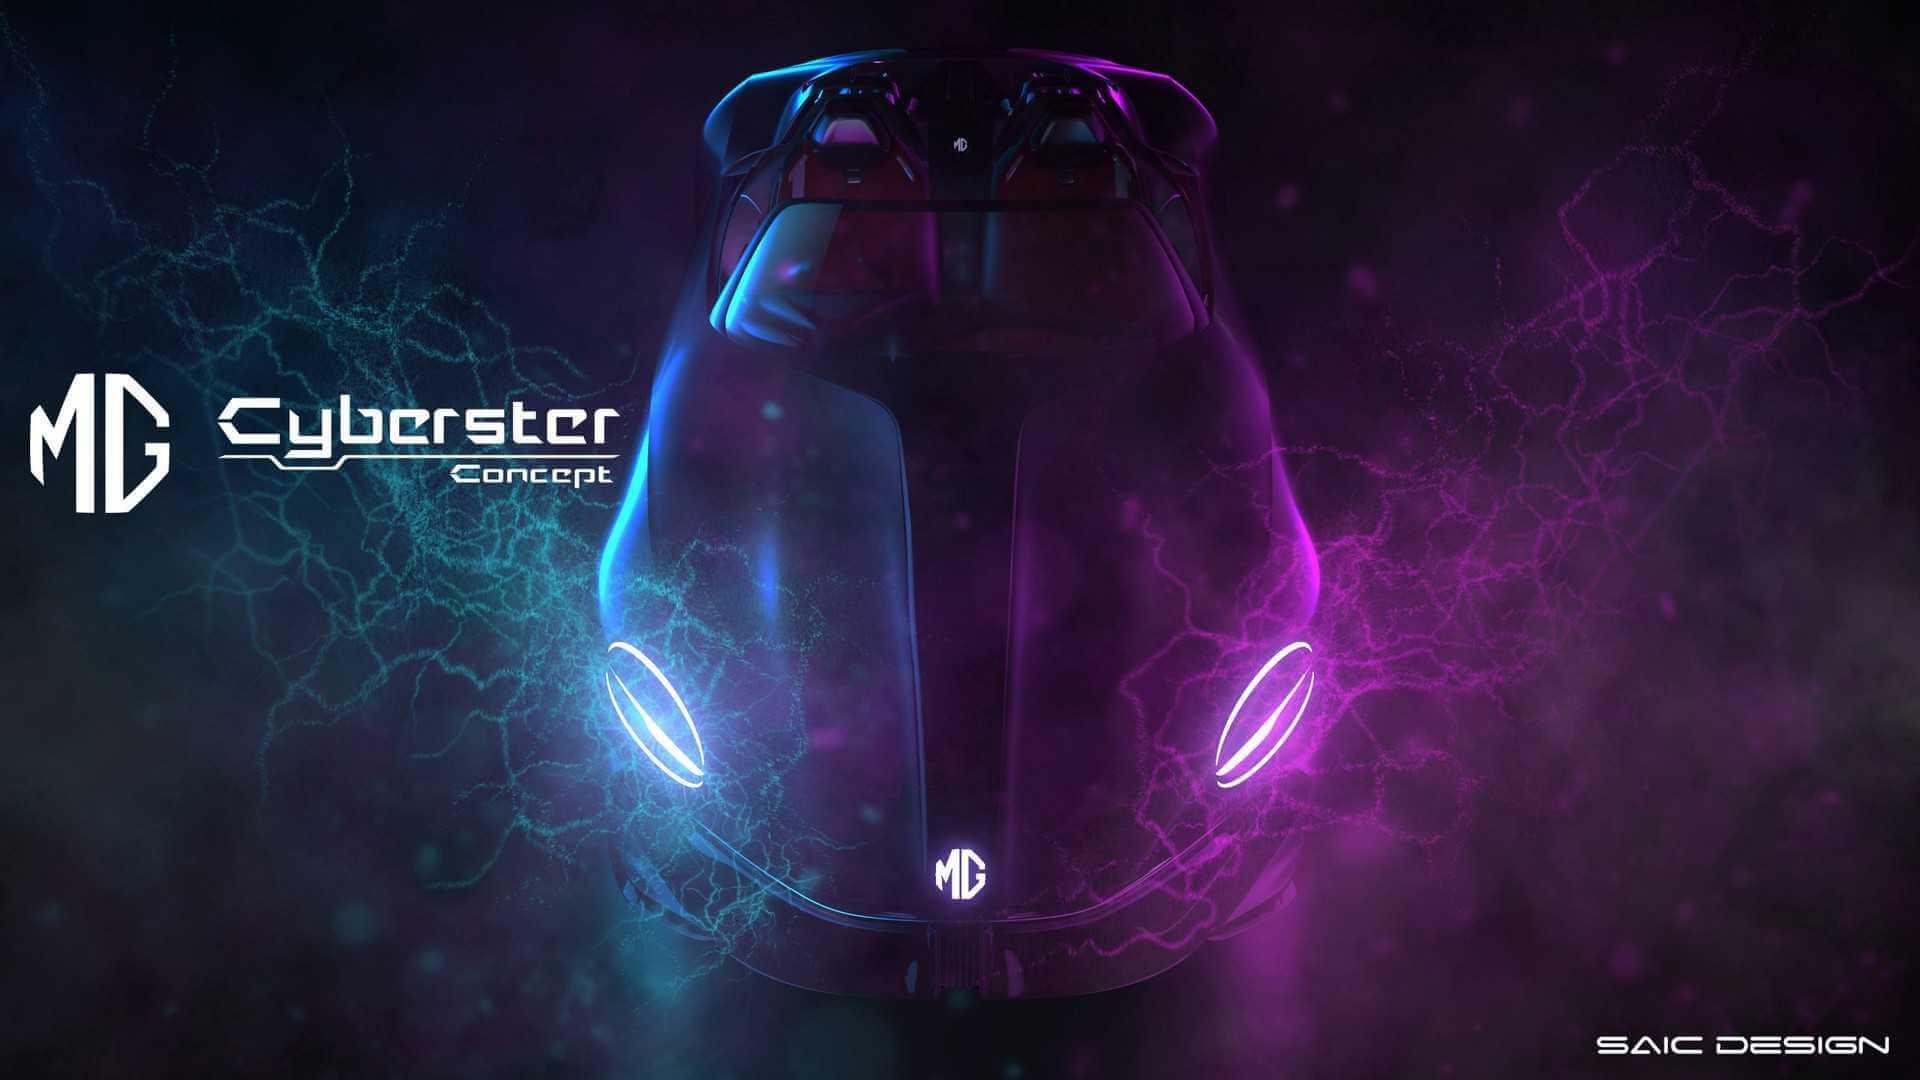 Тизер концепта электрического родстера MG Cyberster